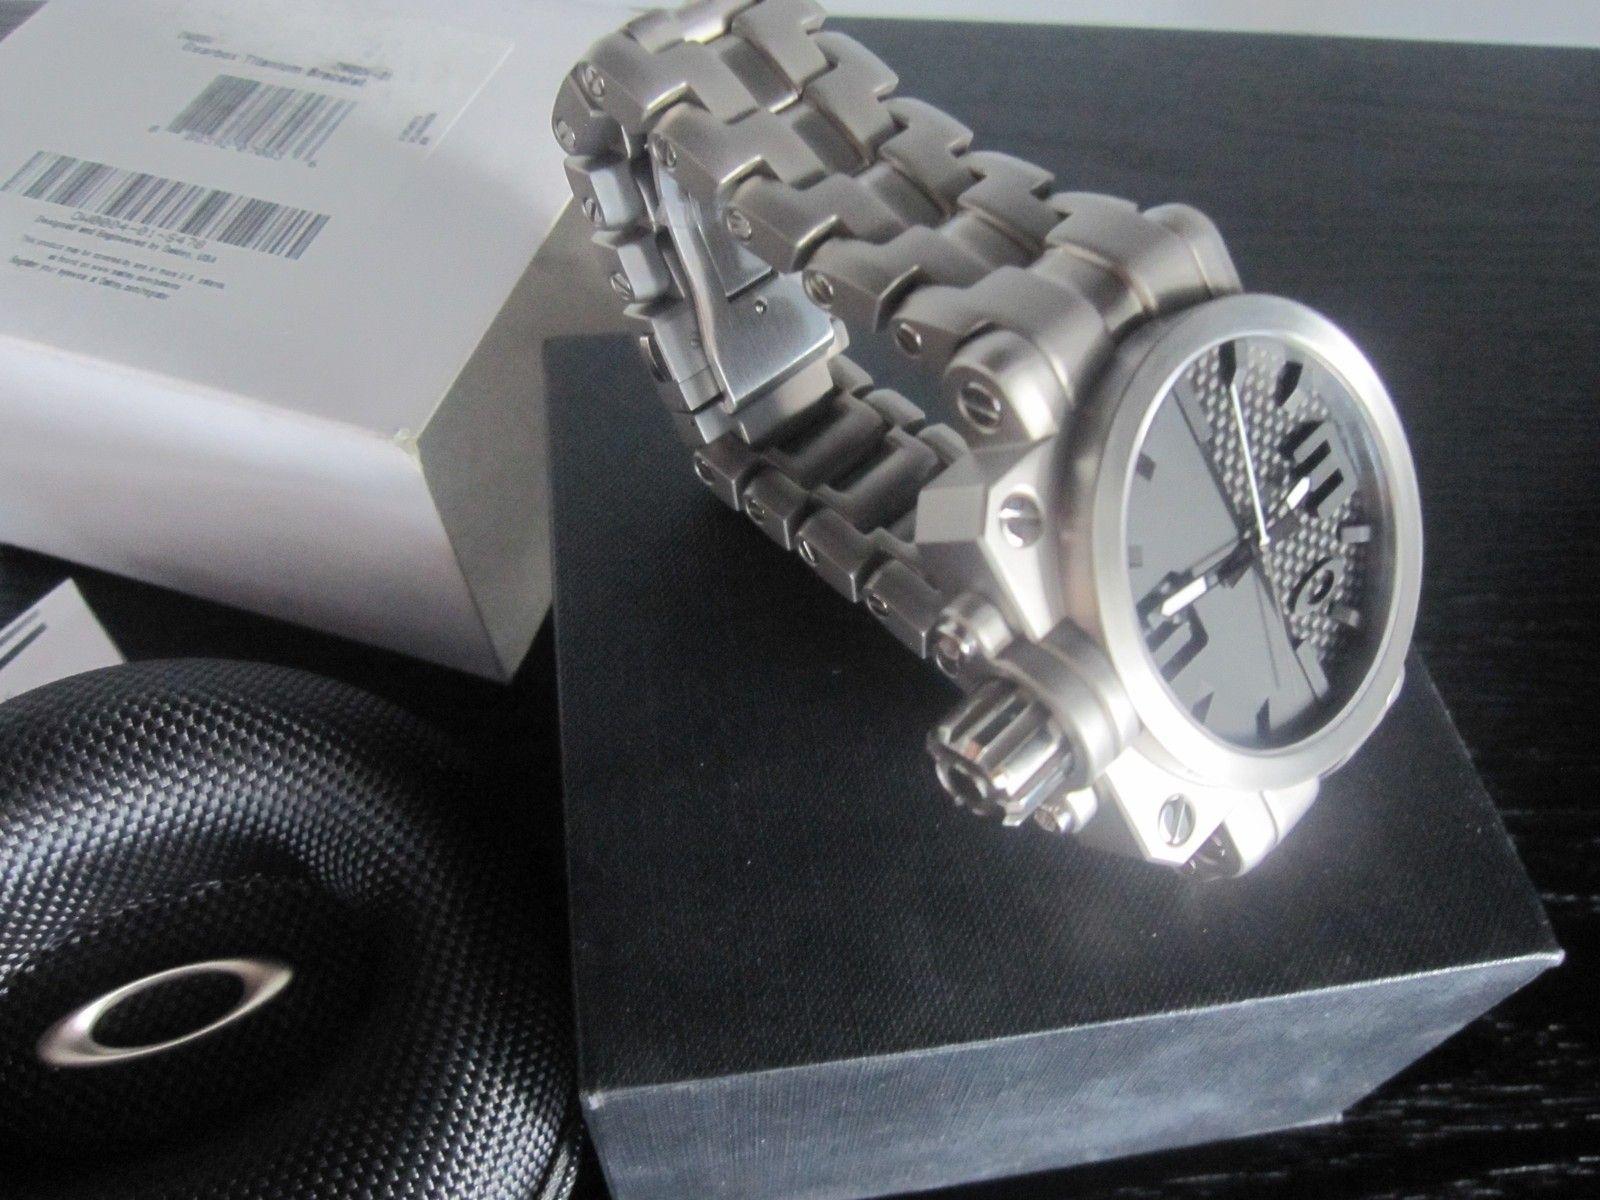 BNIB Gearbox Titanium Bracelet Watch - OW0004-01 - IMG_2498.JPG